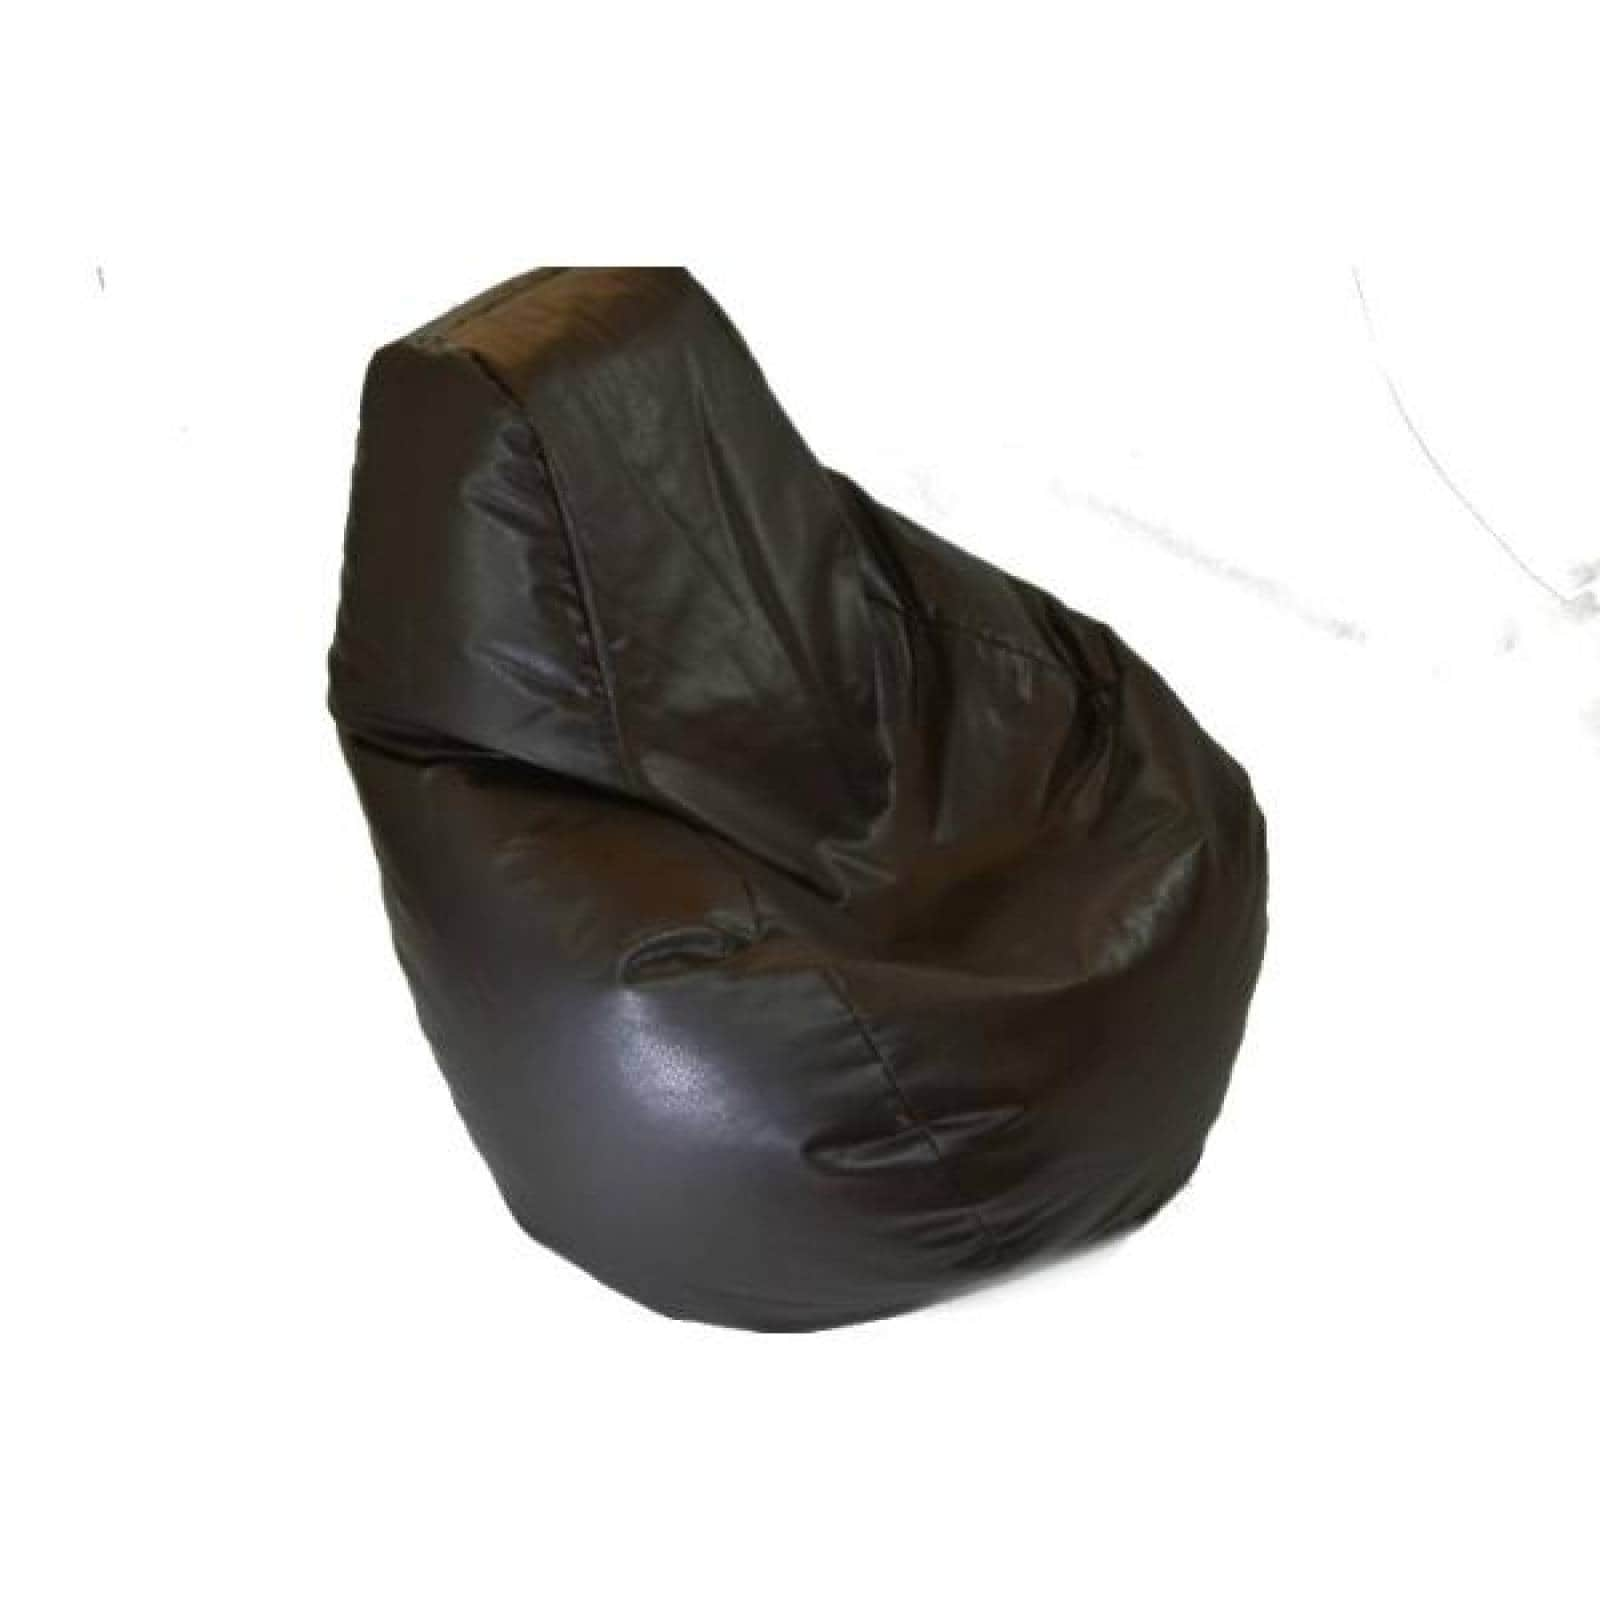 Puff Tipo Pera Mediano Económico Chocolate Lunics